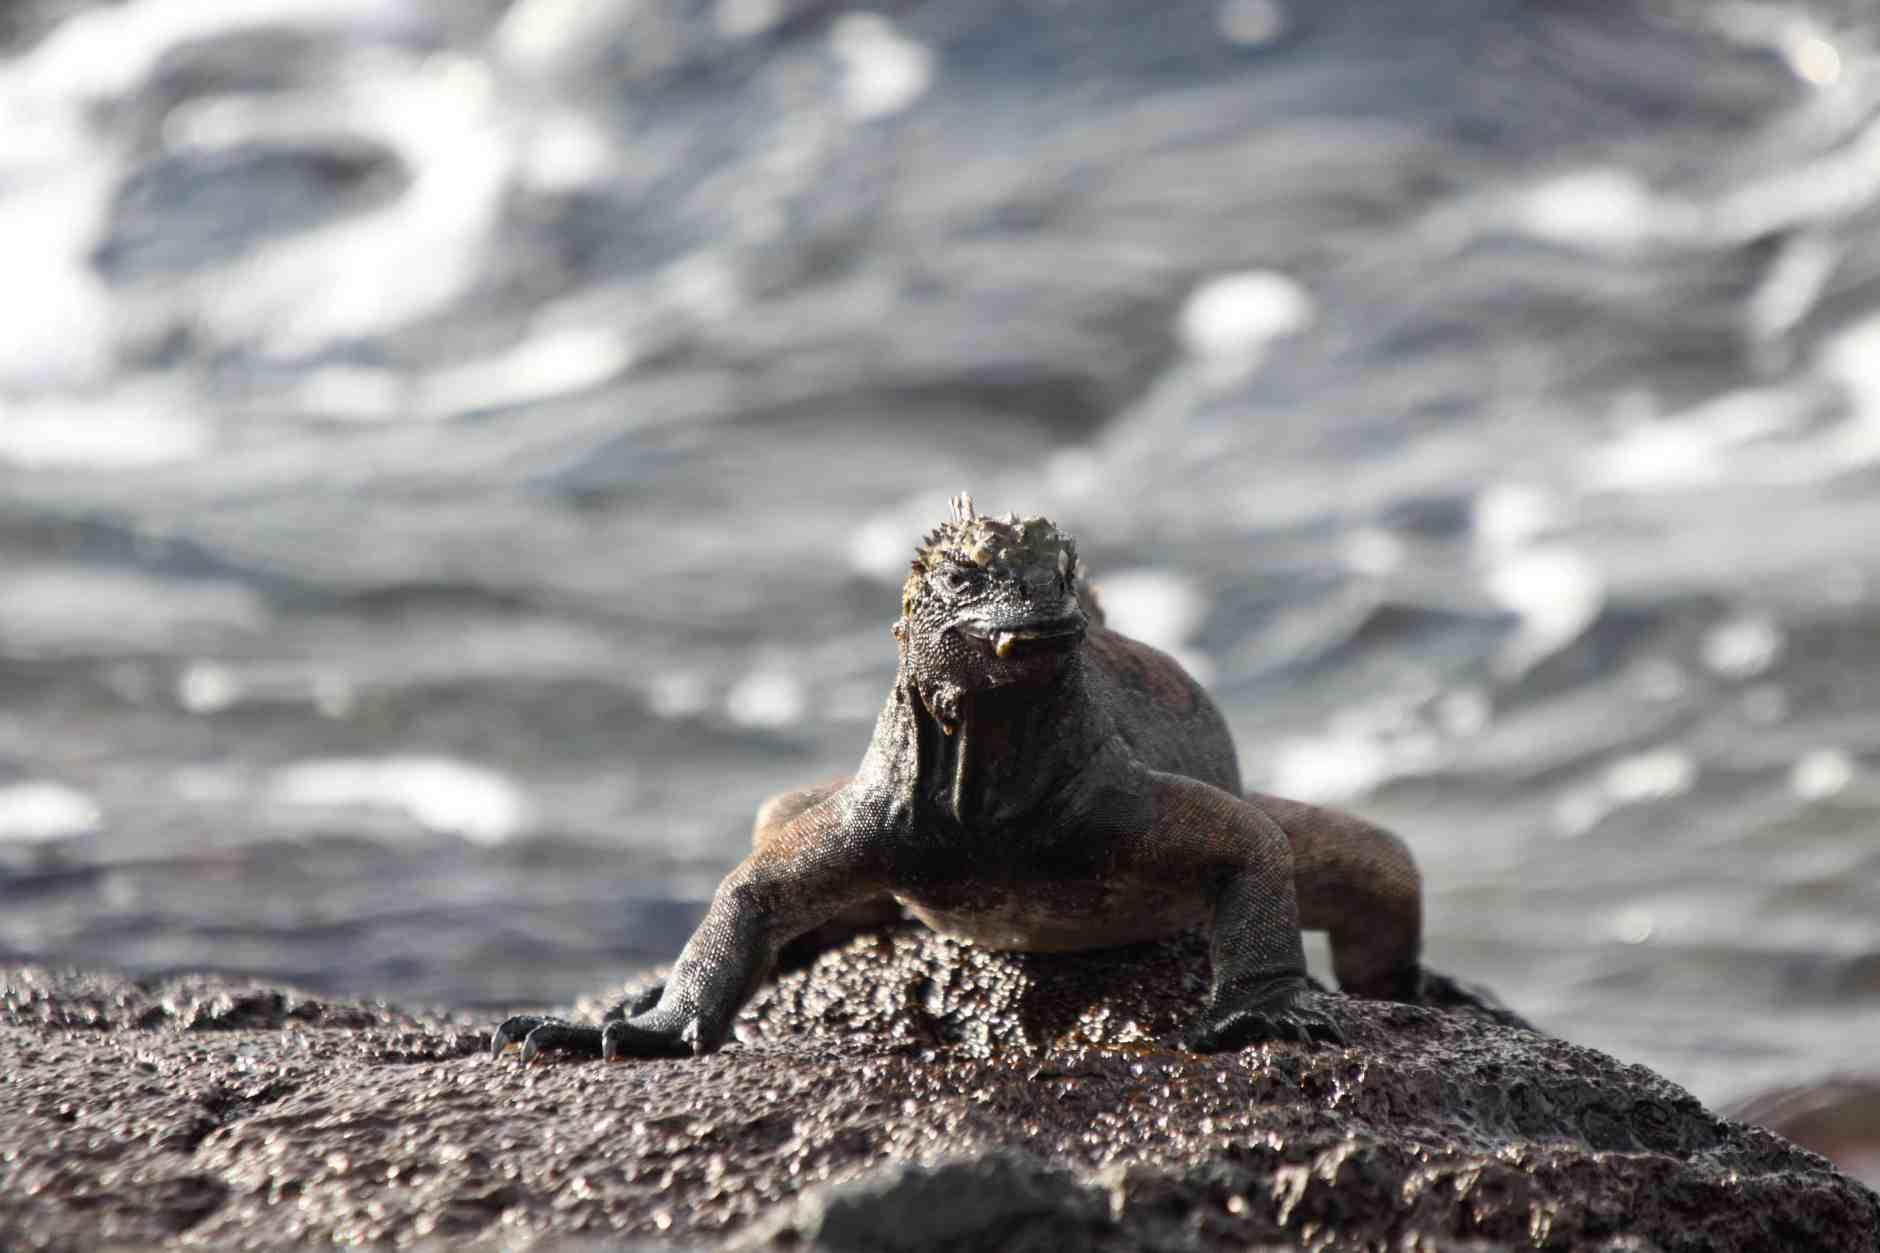 Galapagos Islands - Travel Story | Ecuador's Jurassic Park